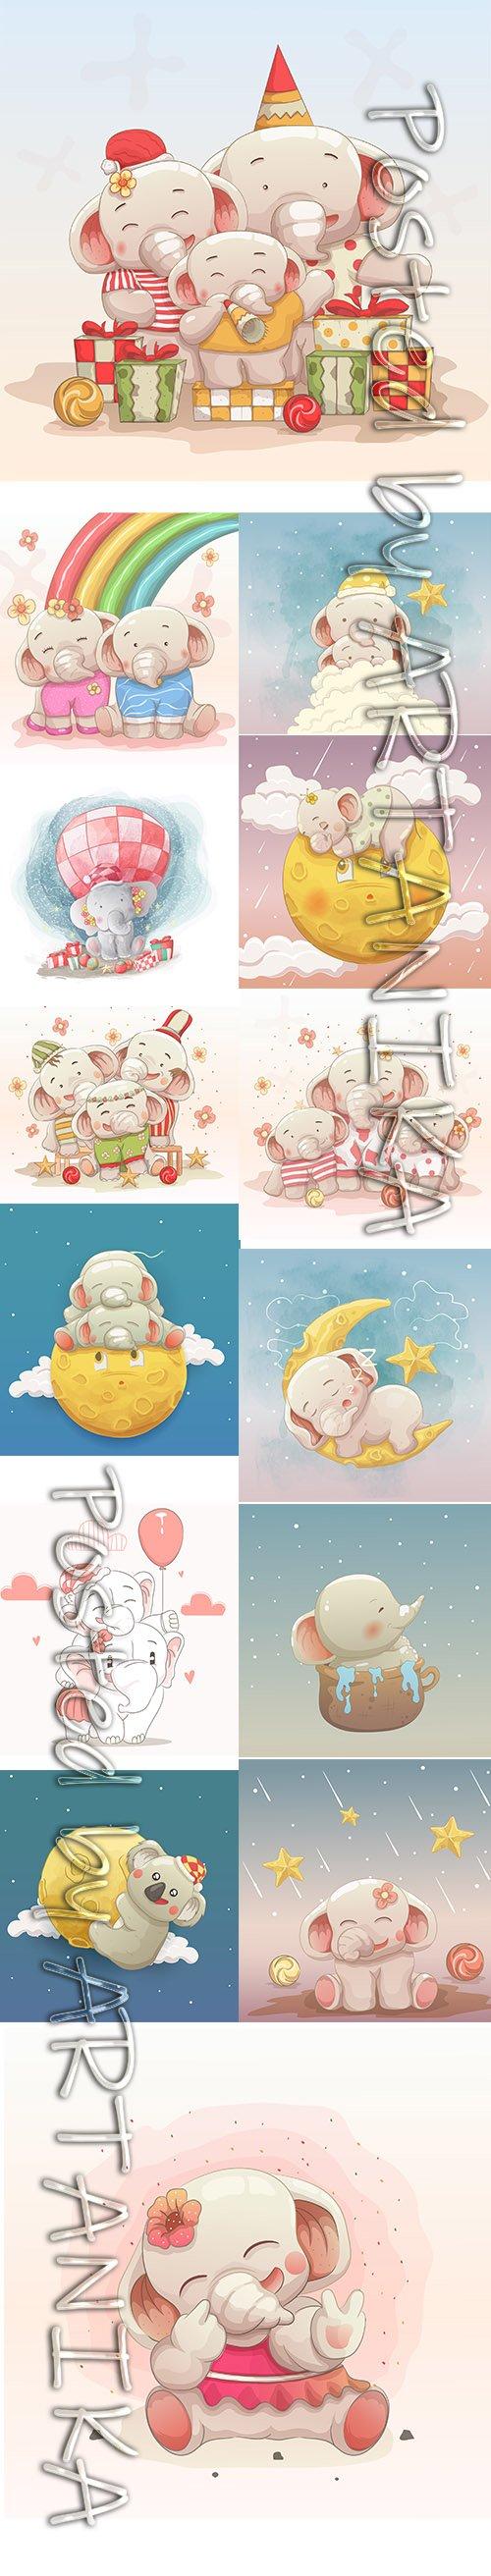 Vector Set - Cute Elephant Baby Illustrations